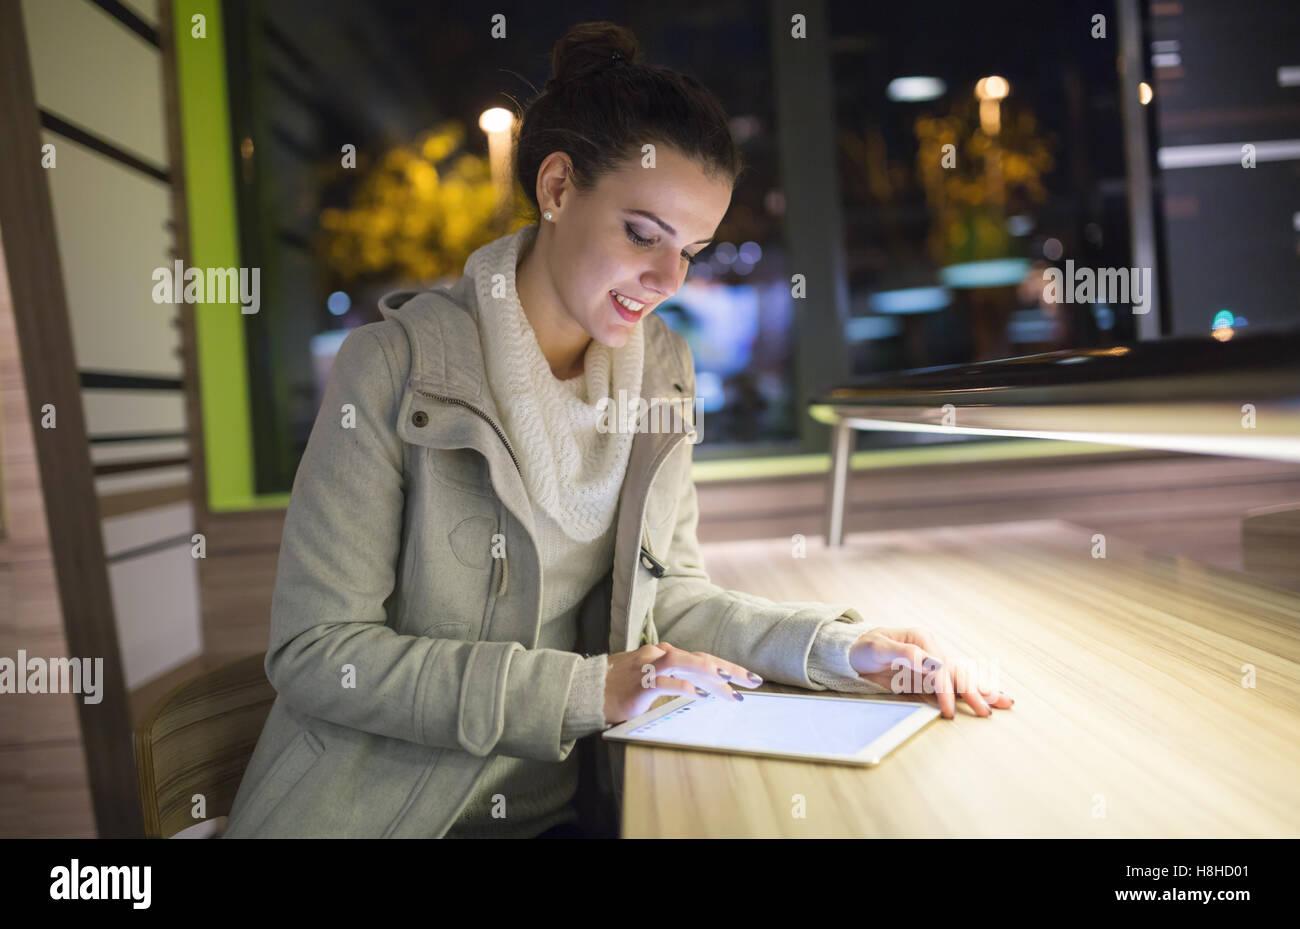 Brünette Frau mit Tablet nach der Arbeit Stockbild